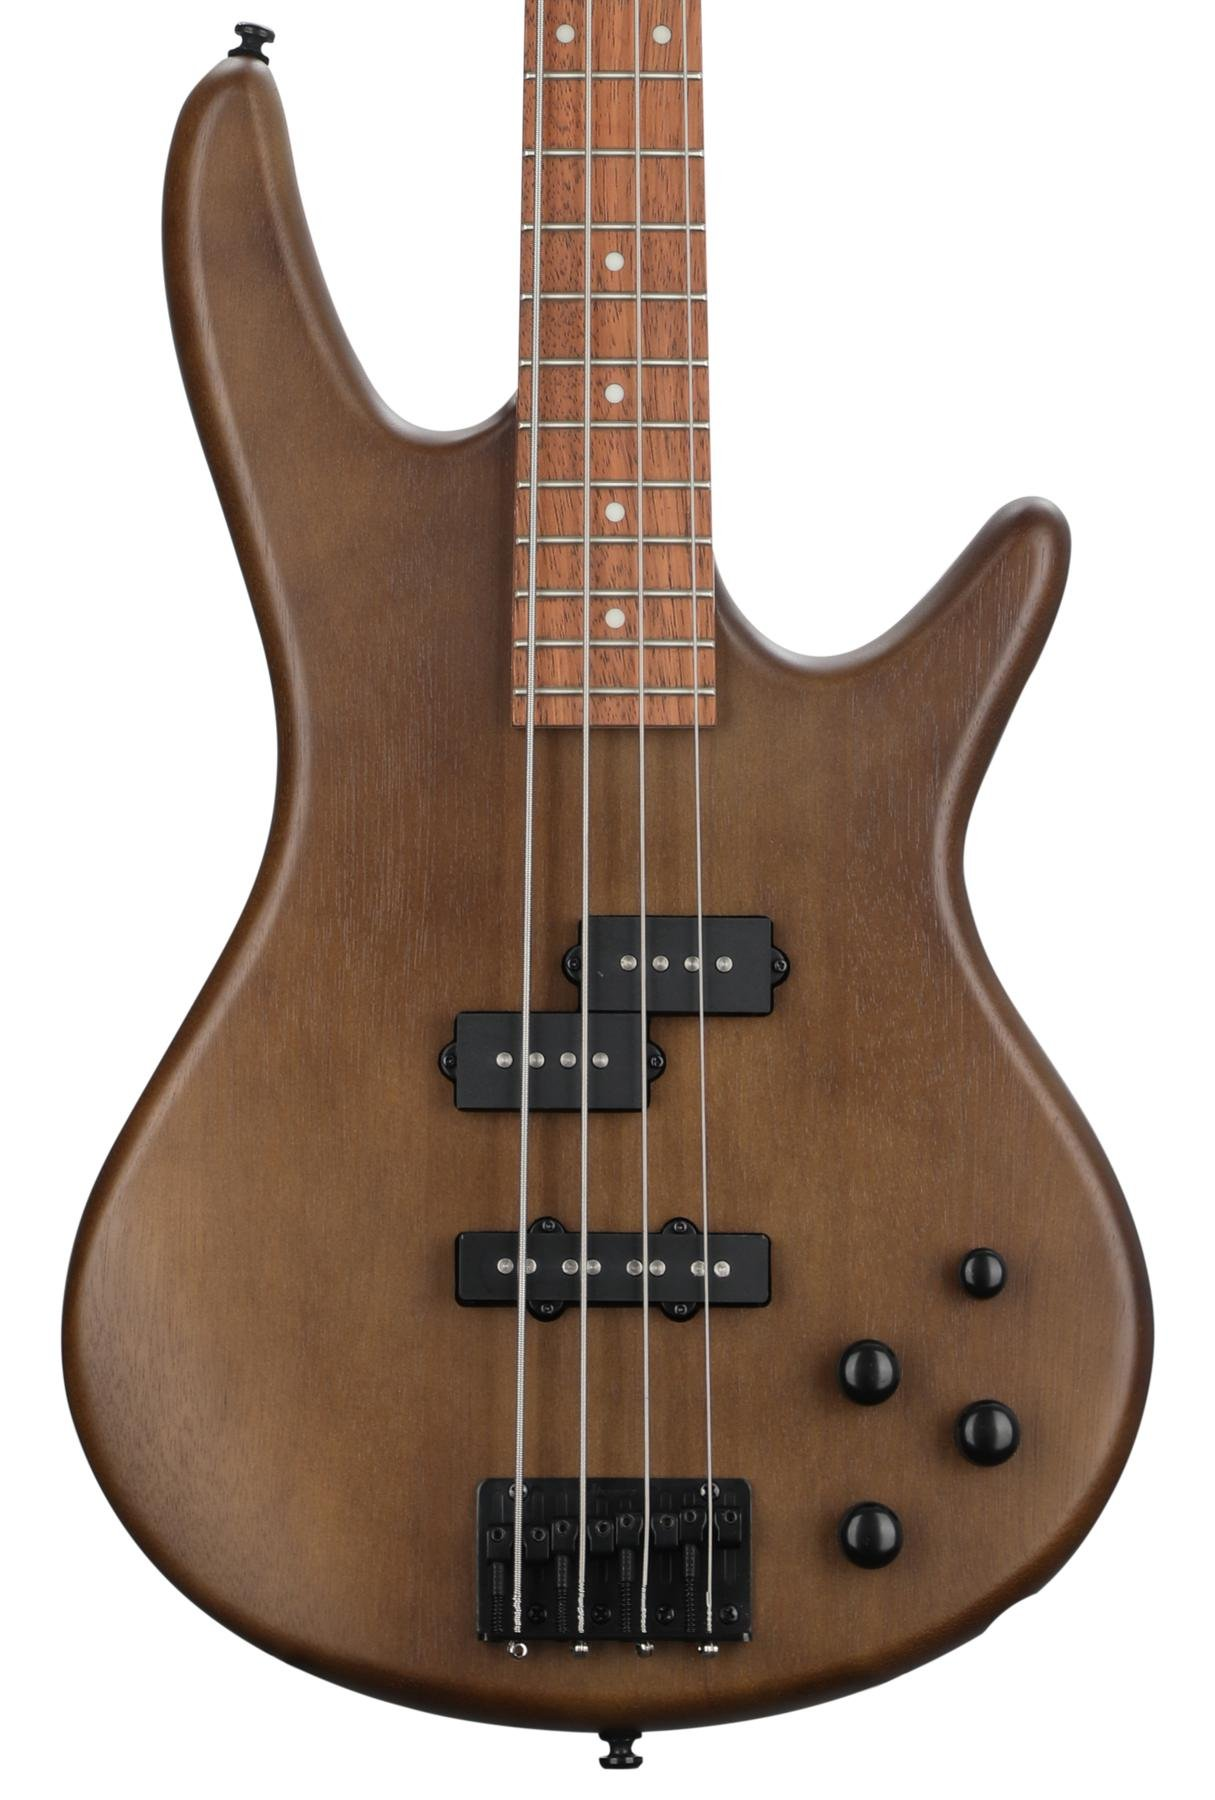 Walnut Flat Ibanez GSR 4 String Bass Guitar Left GSR200BLWNF